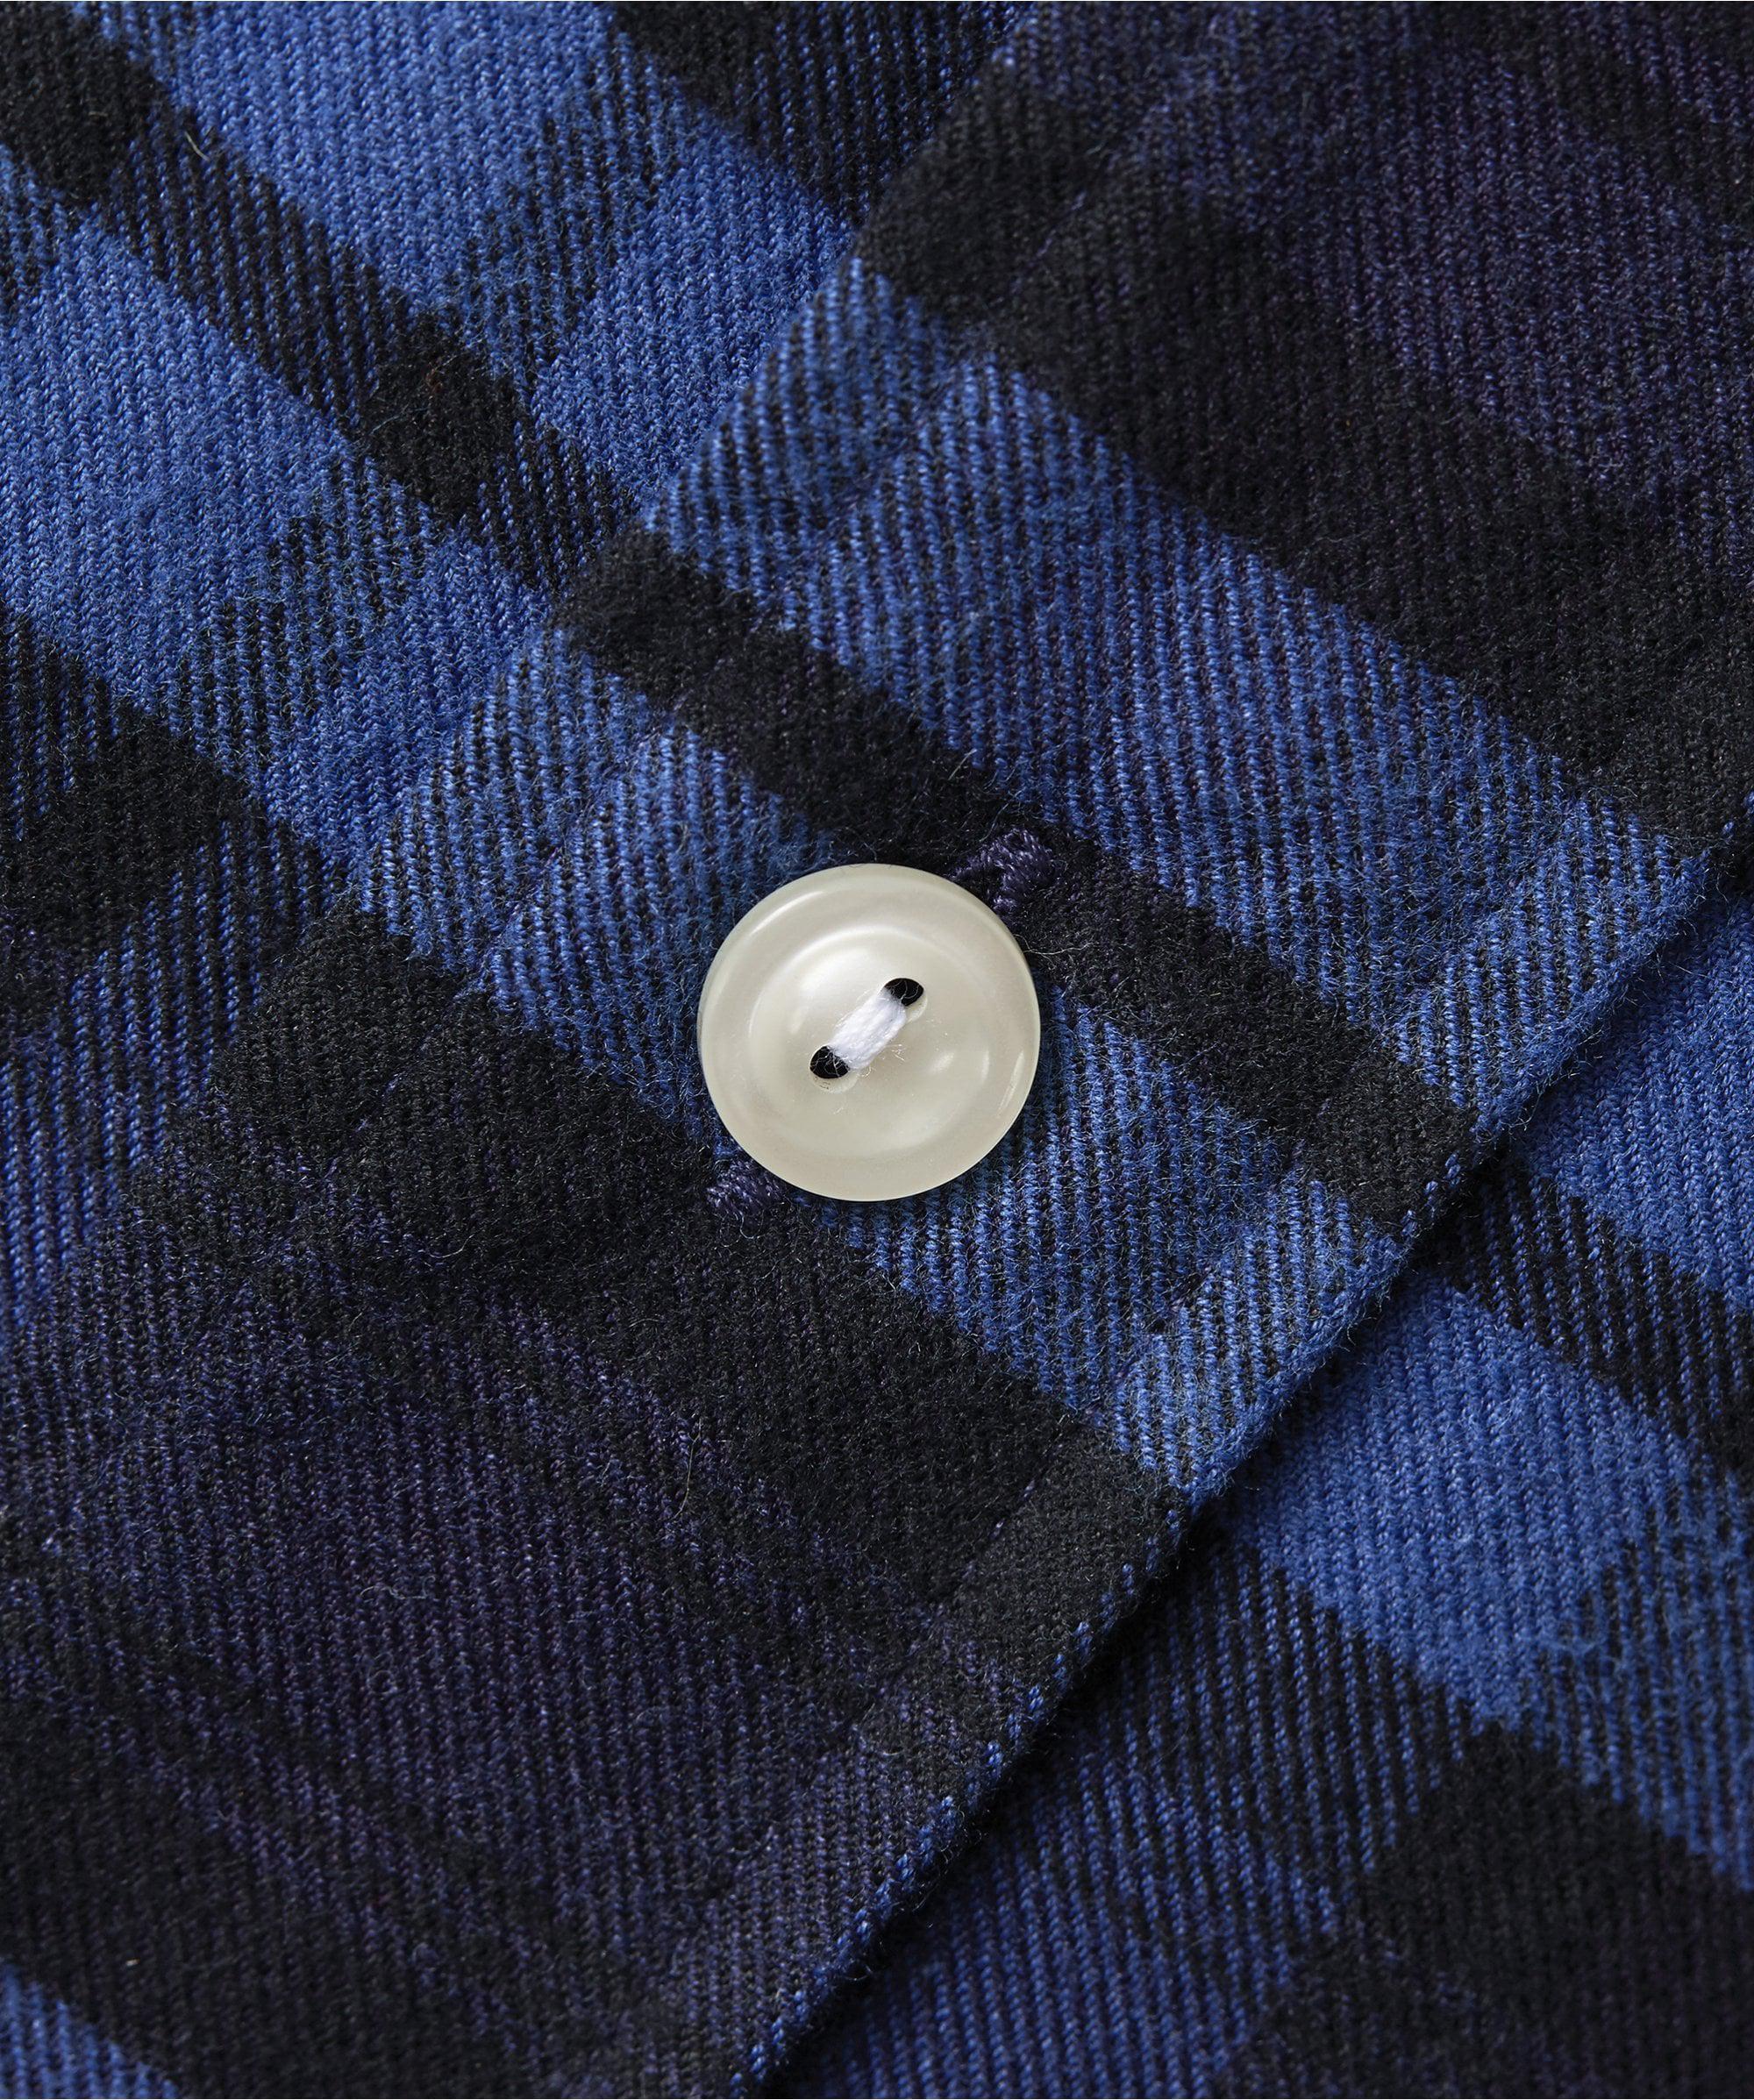 fd6b7a8212c Eton of Sweden Slim Fit Plaid Flannel Shirt in Blue for Men - Save  15.17857142857143% - Lyst